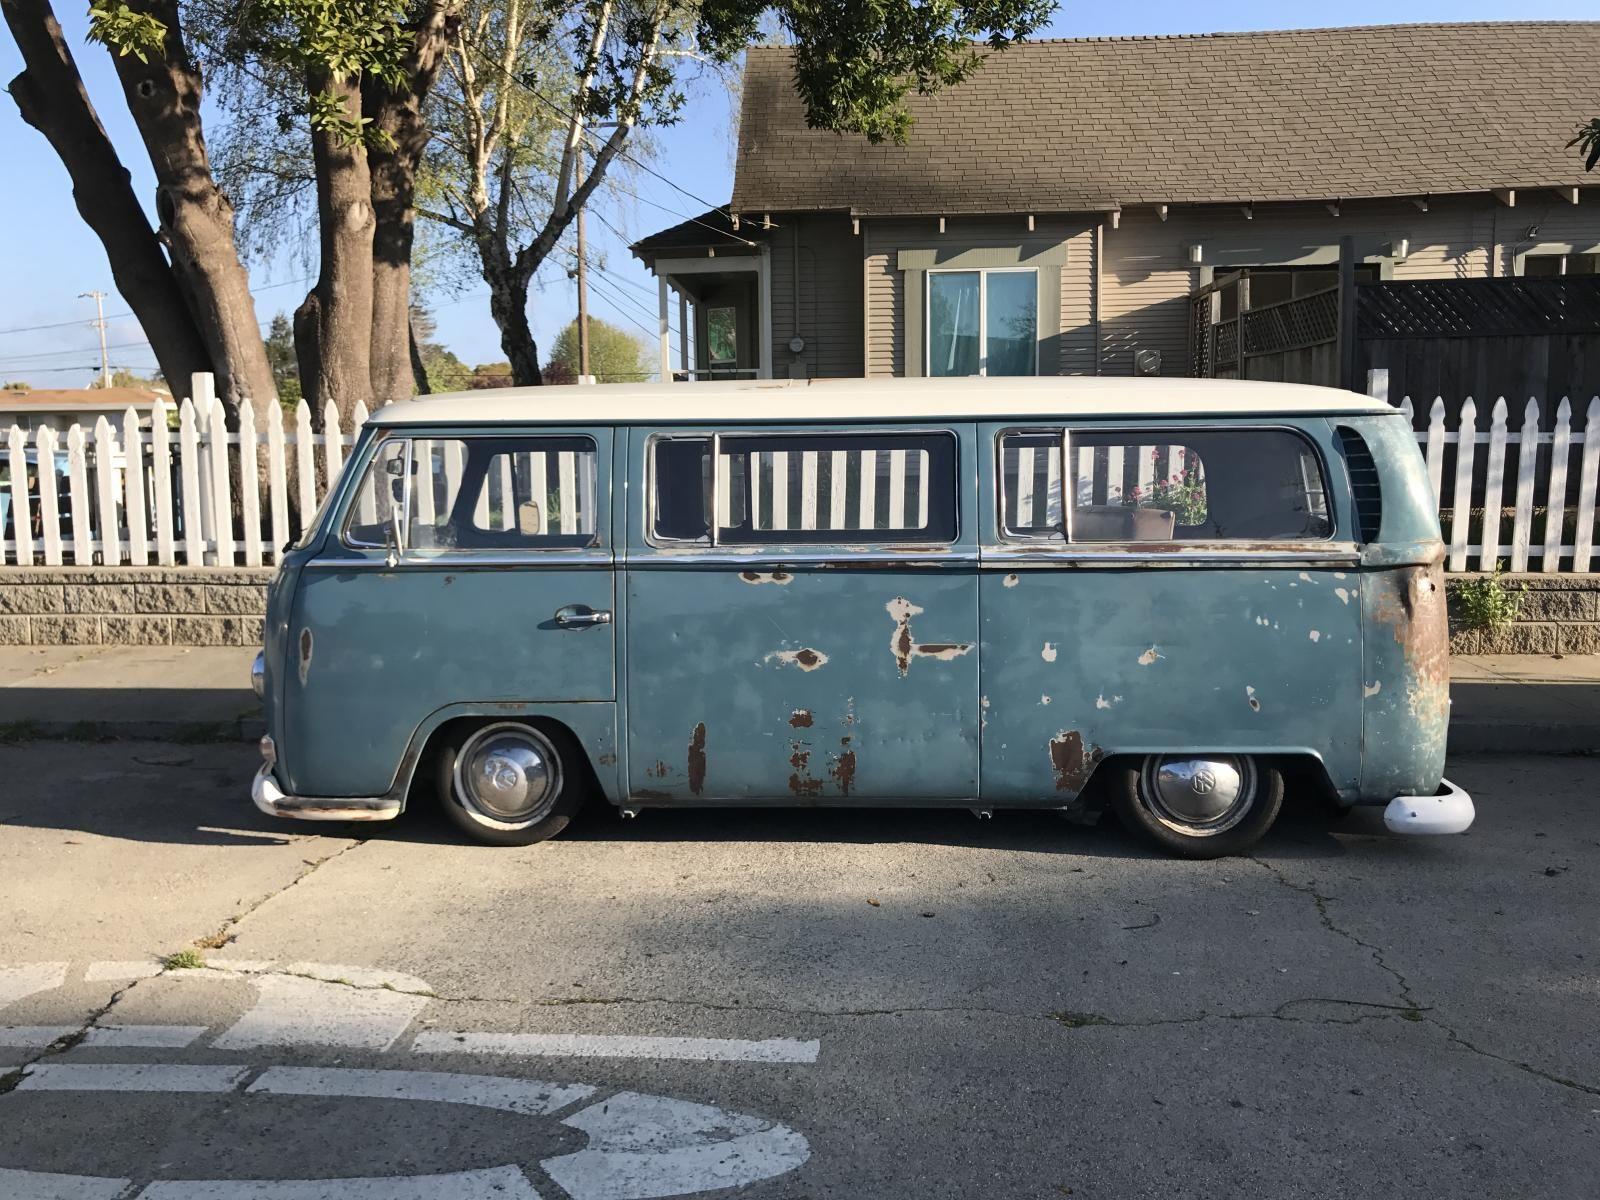 Frame Notch Battery Tray Vw Bus T2 Vw Bus Vw Camper